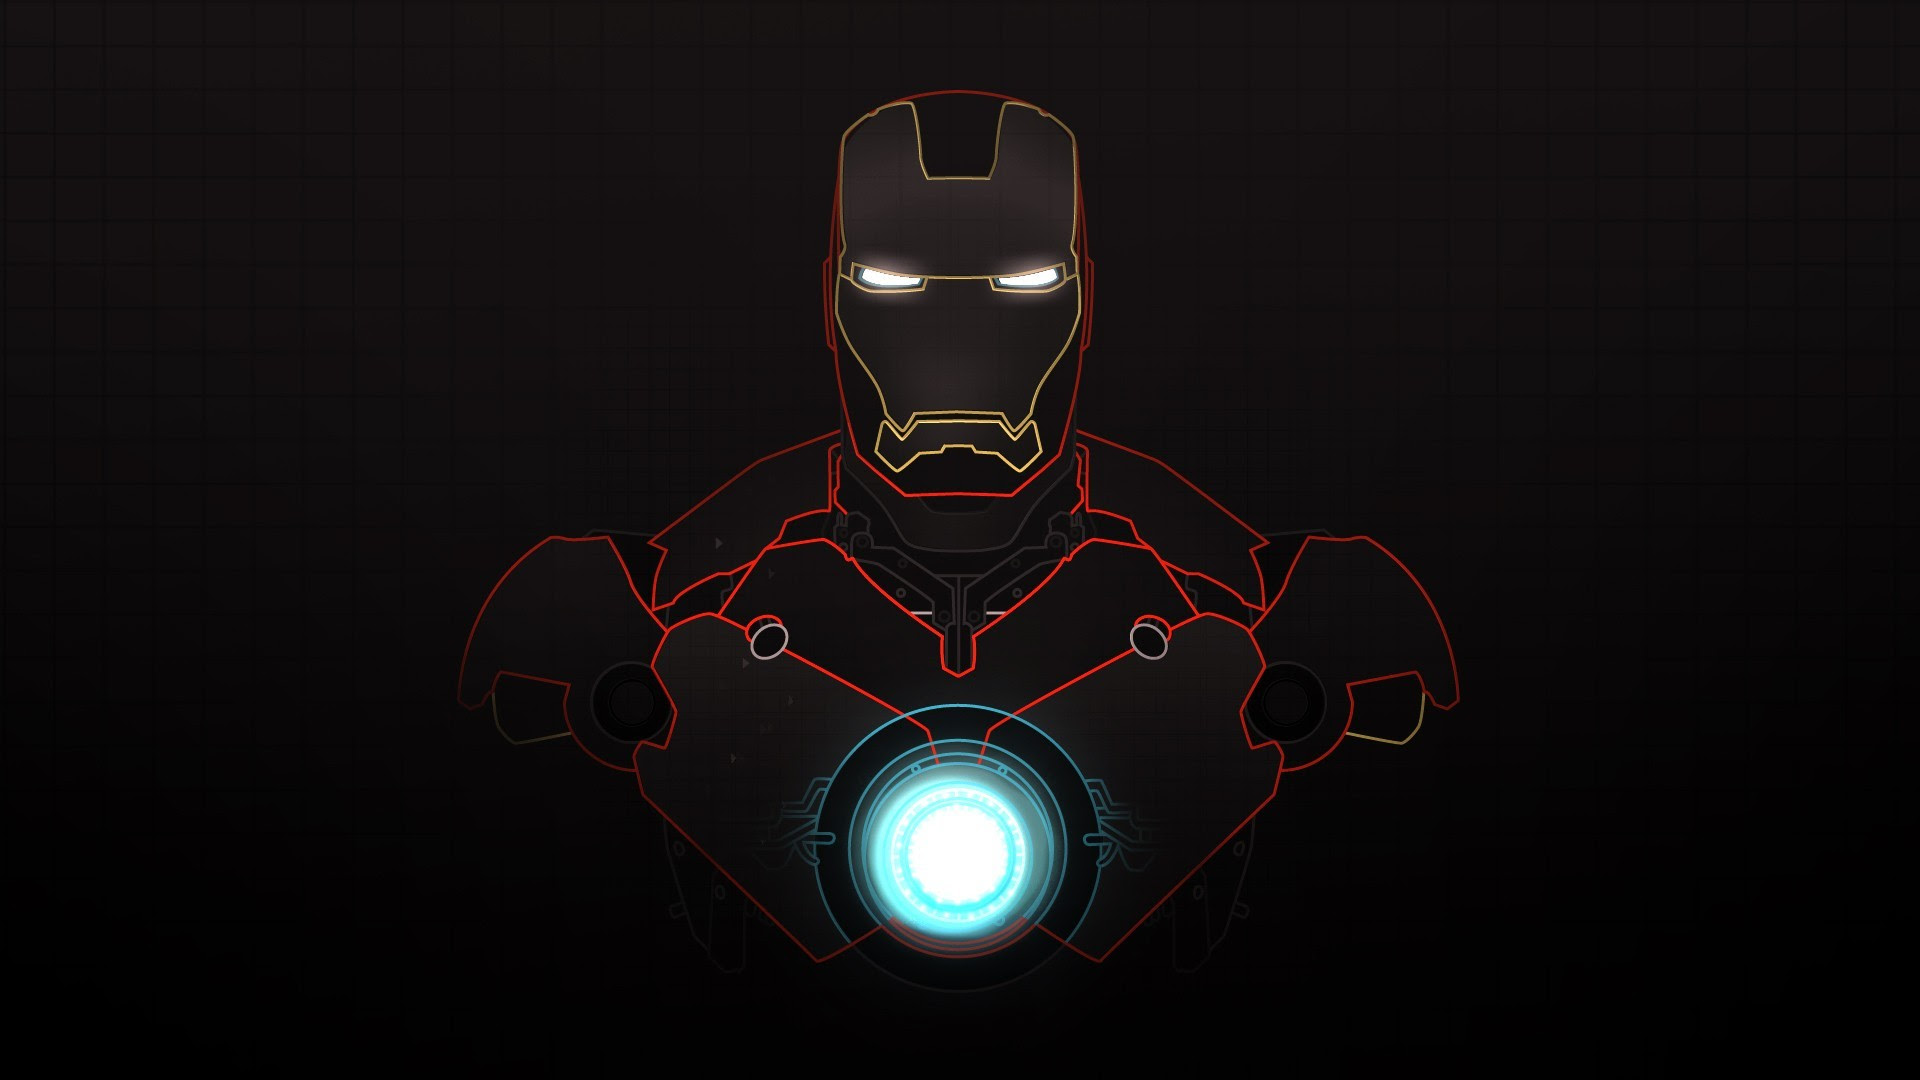 Iron Man wallpaper [1920x1080] : wallpapers